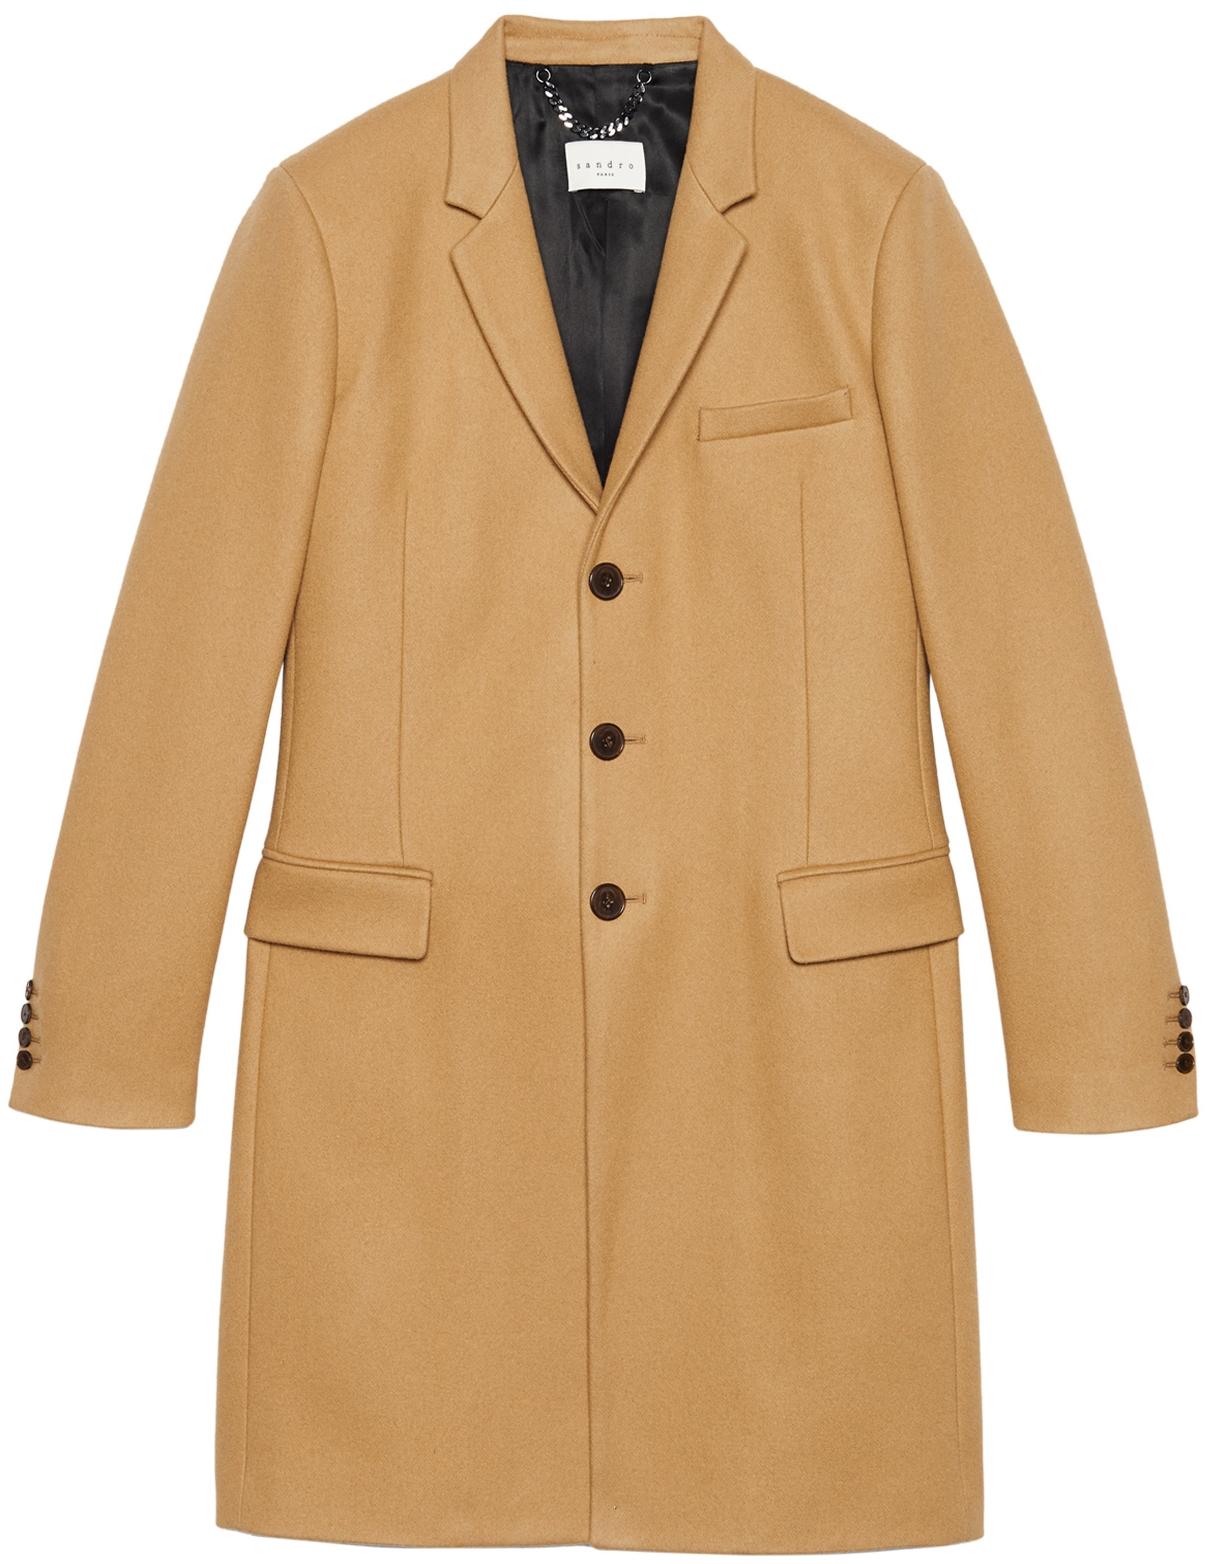 Sandro Apollo Coat, $775